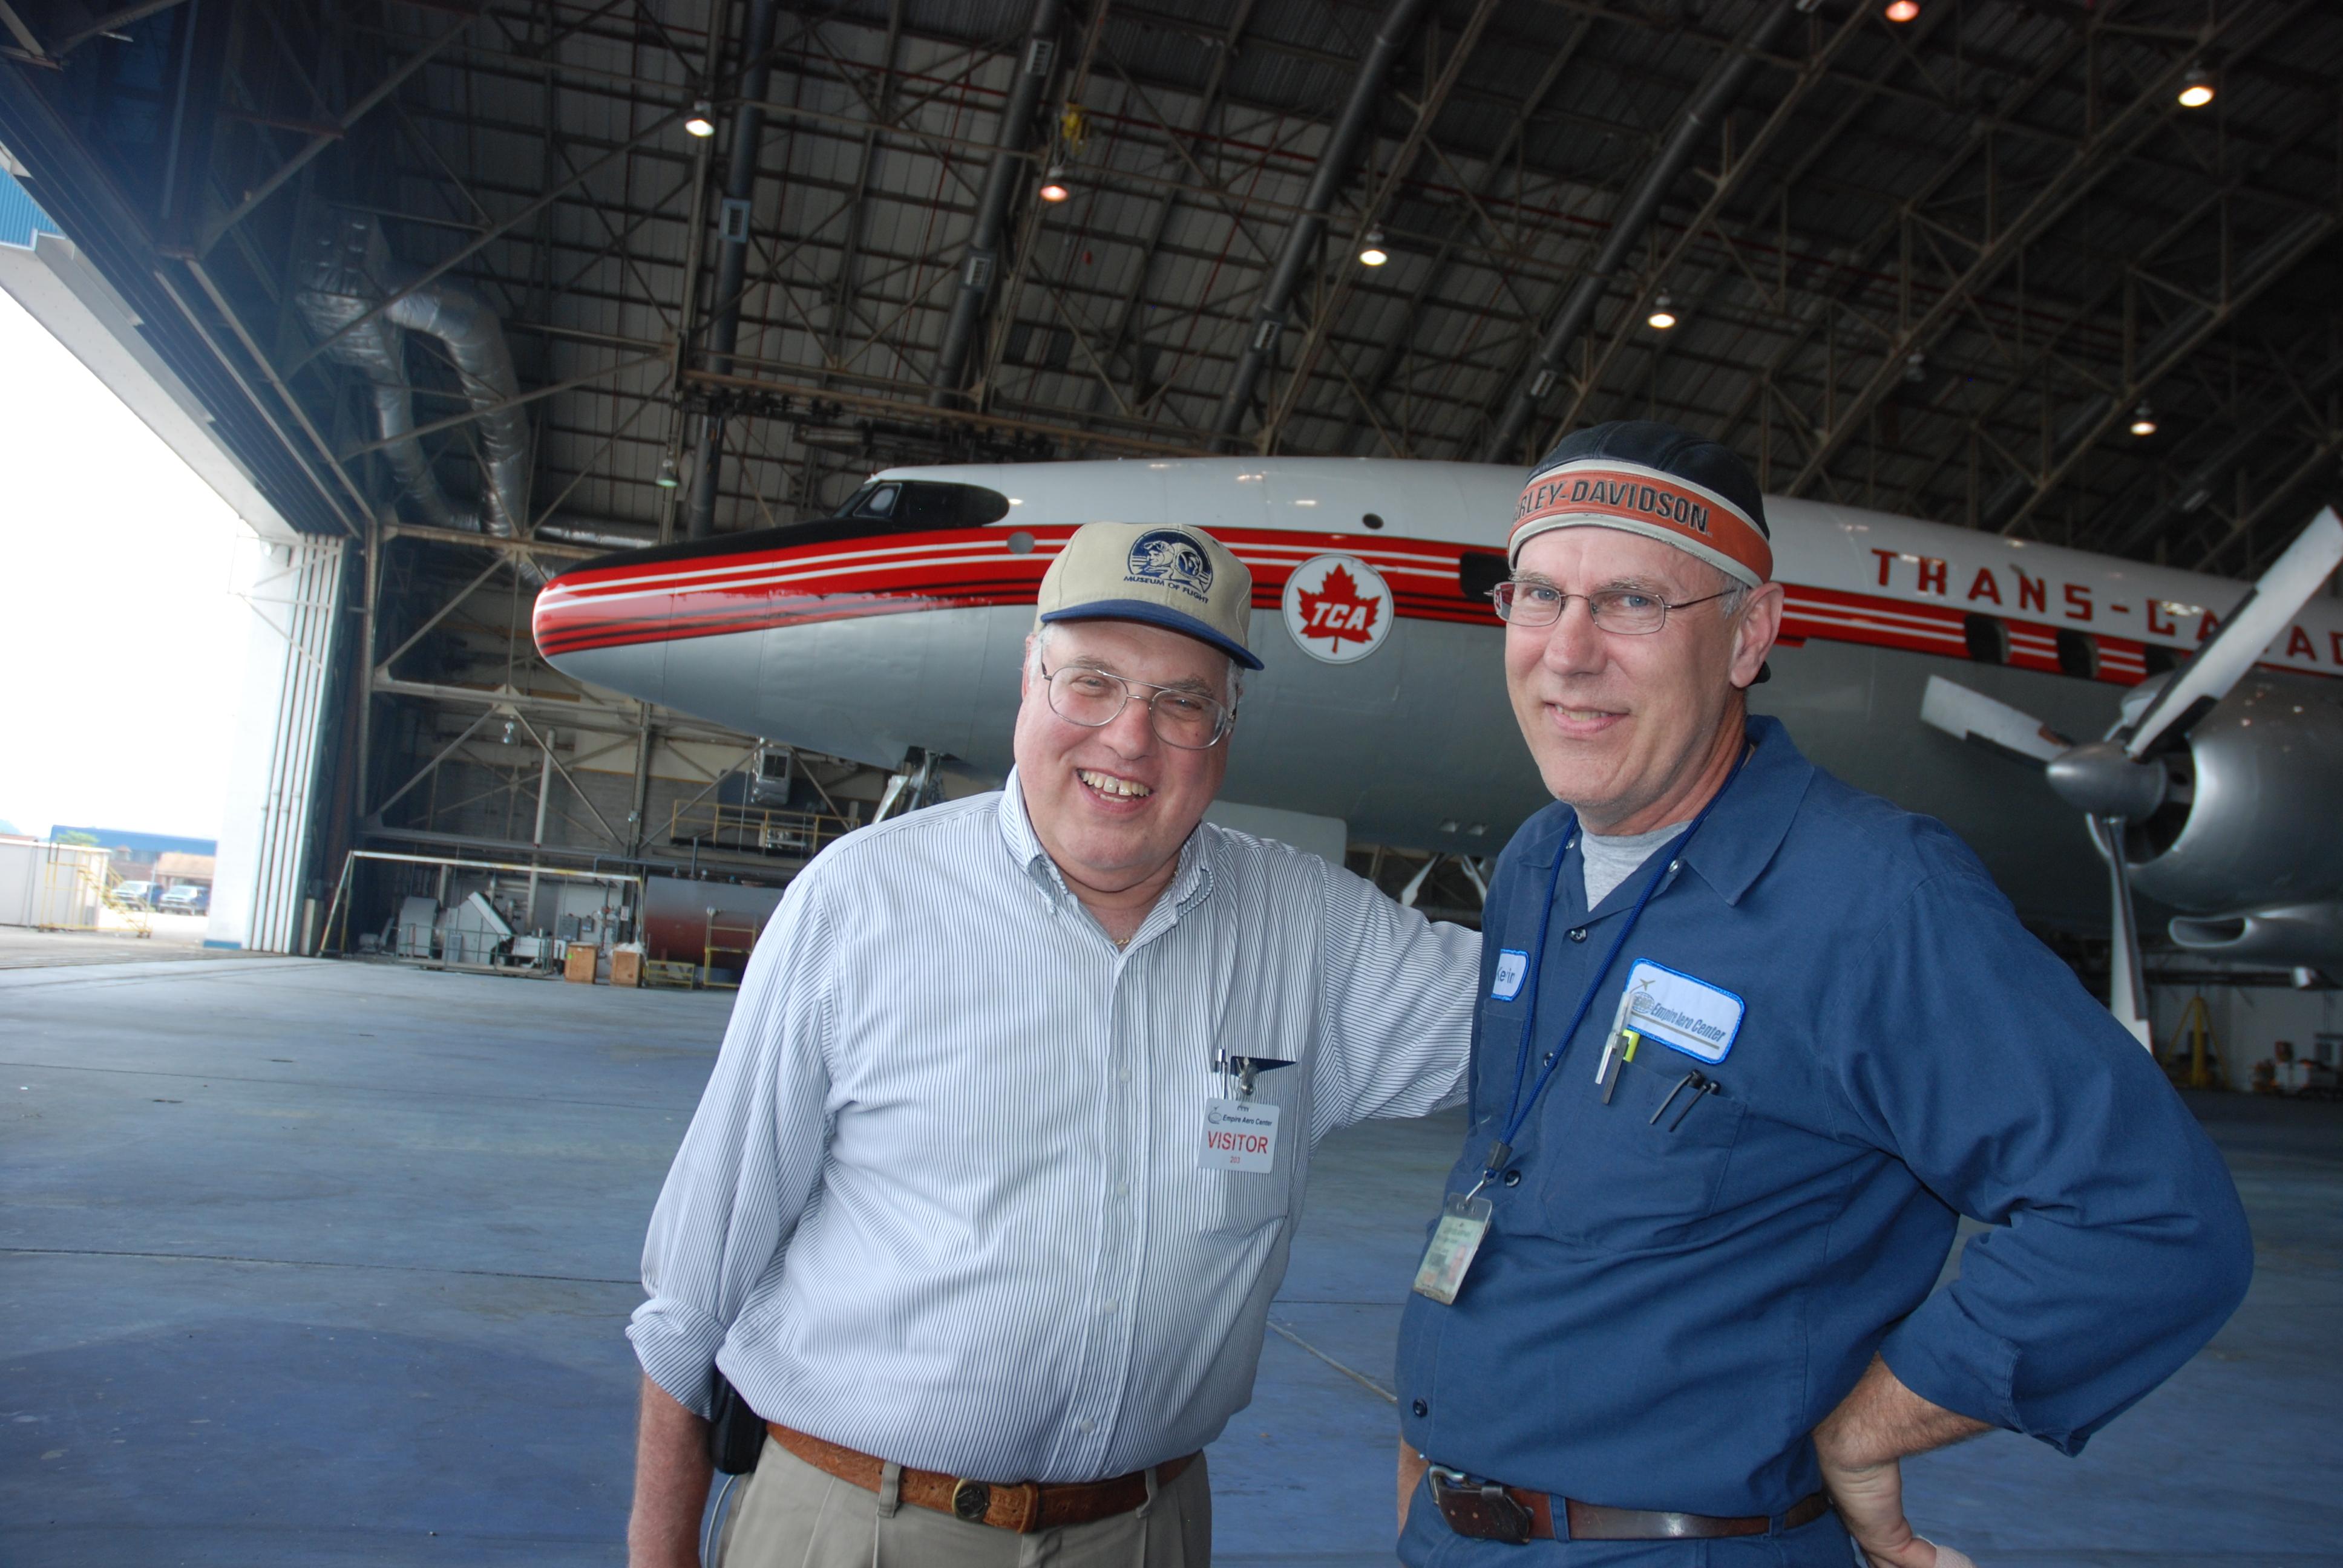 Bob Bogash and Kevin Lacey -- kingpins of the TCA Super Connie project. (Ken Swartz)